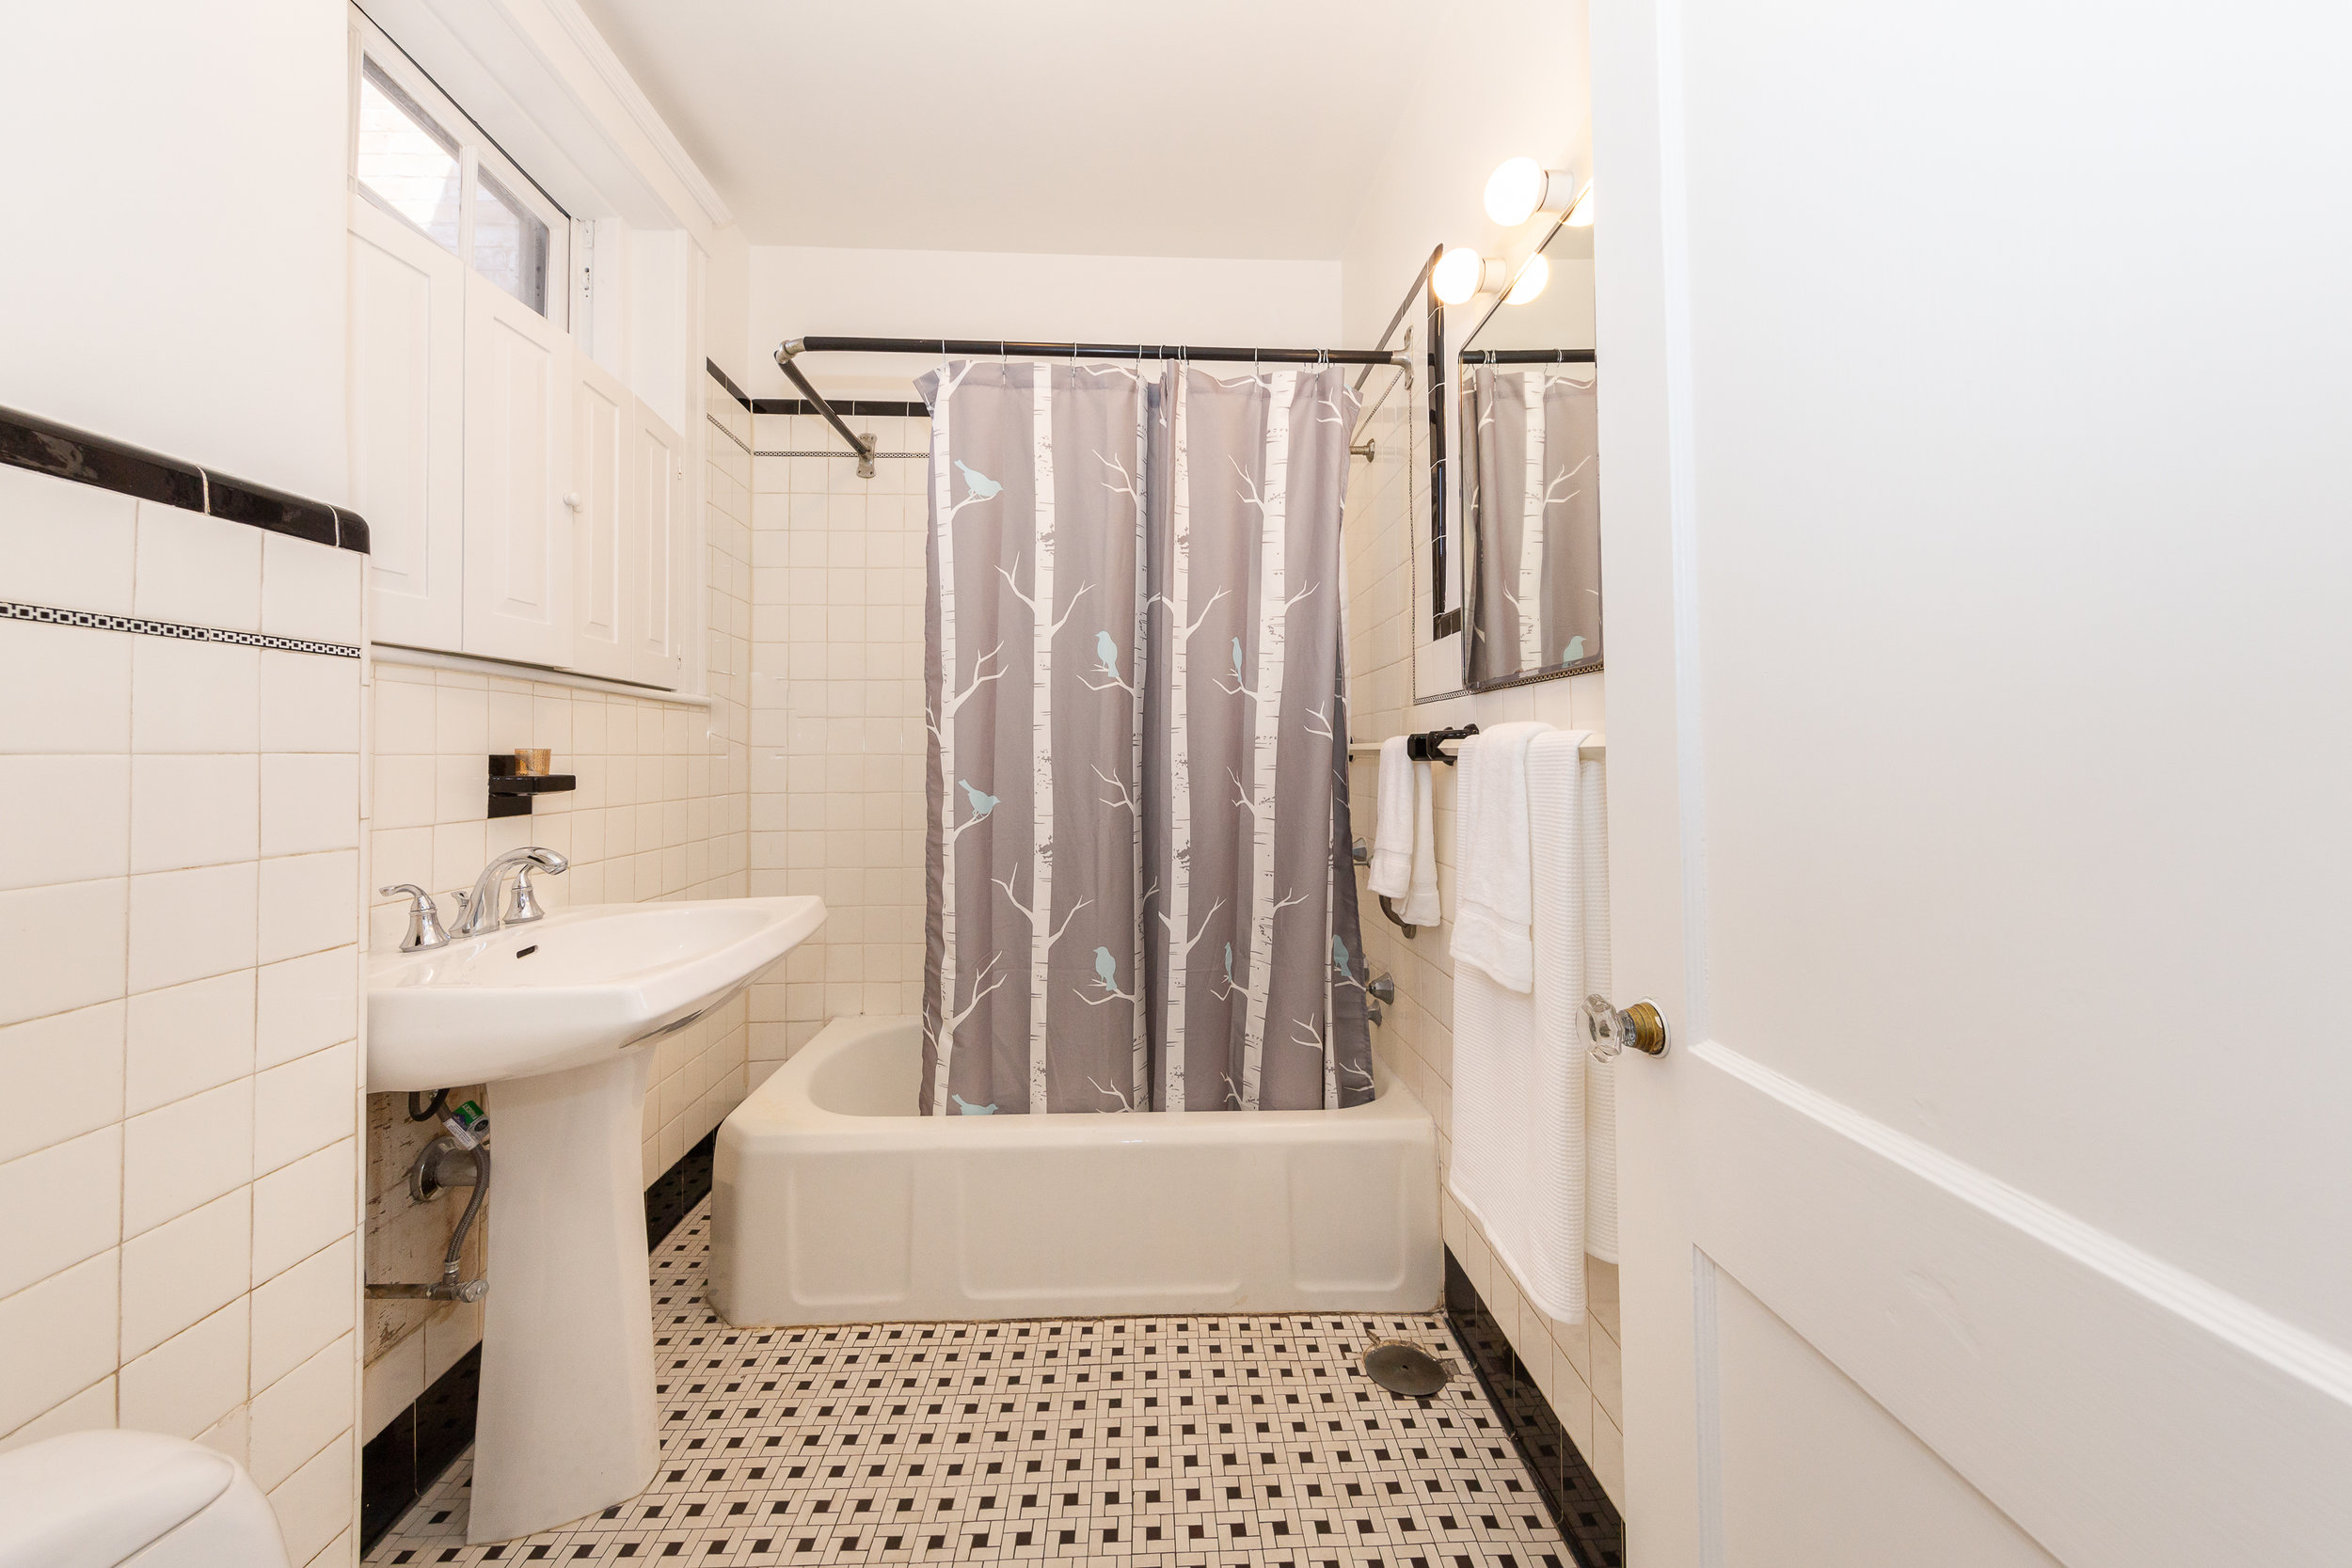 1783 Massachusetts Ave, Cambridge, MA_Property-Precision-10.jpg